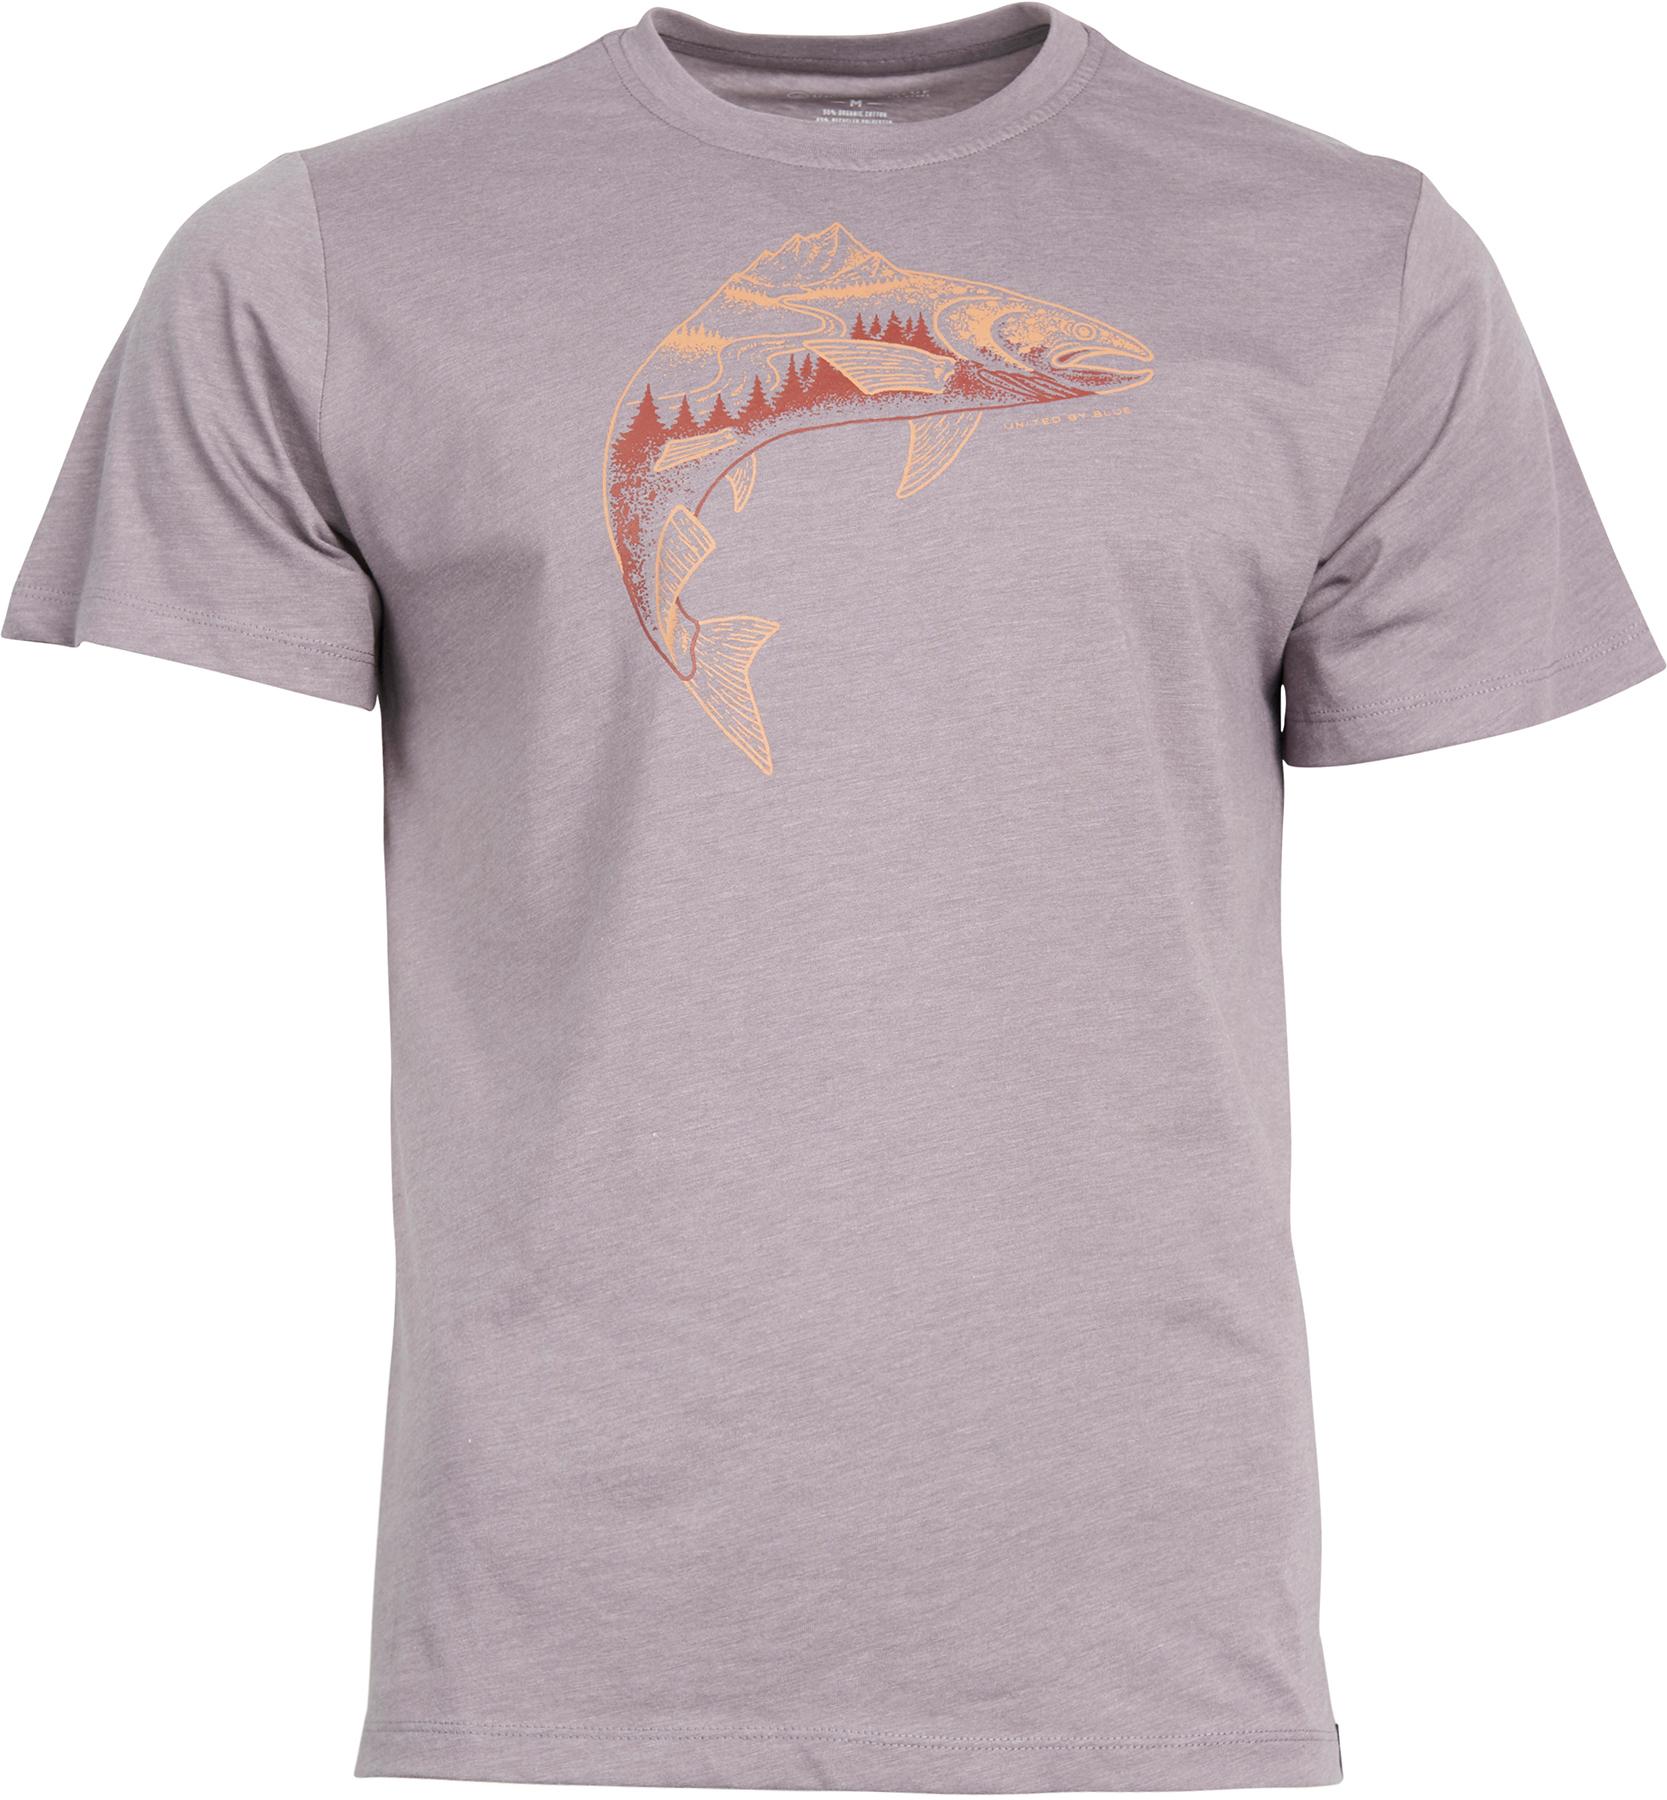 3fd2b2238de Short sleeved shirts for travel